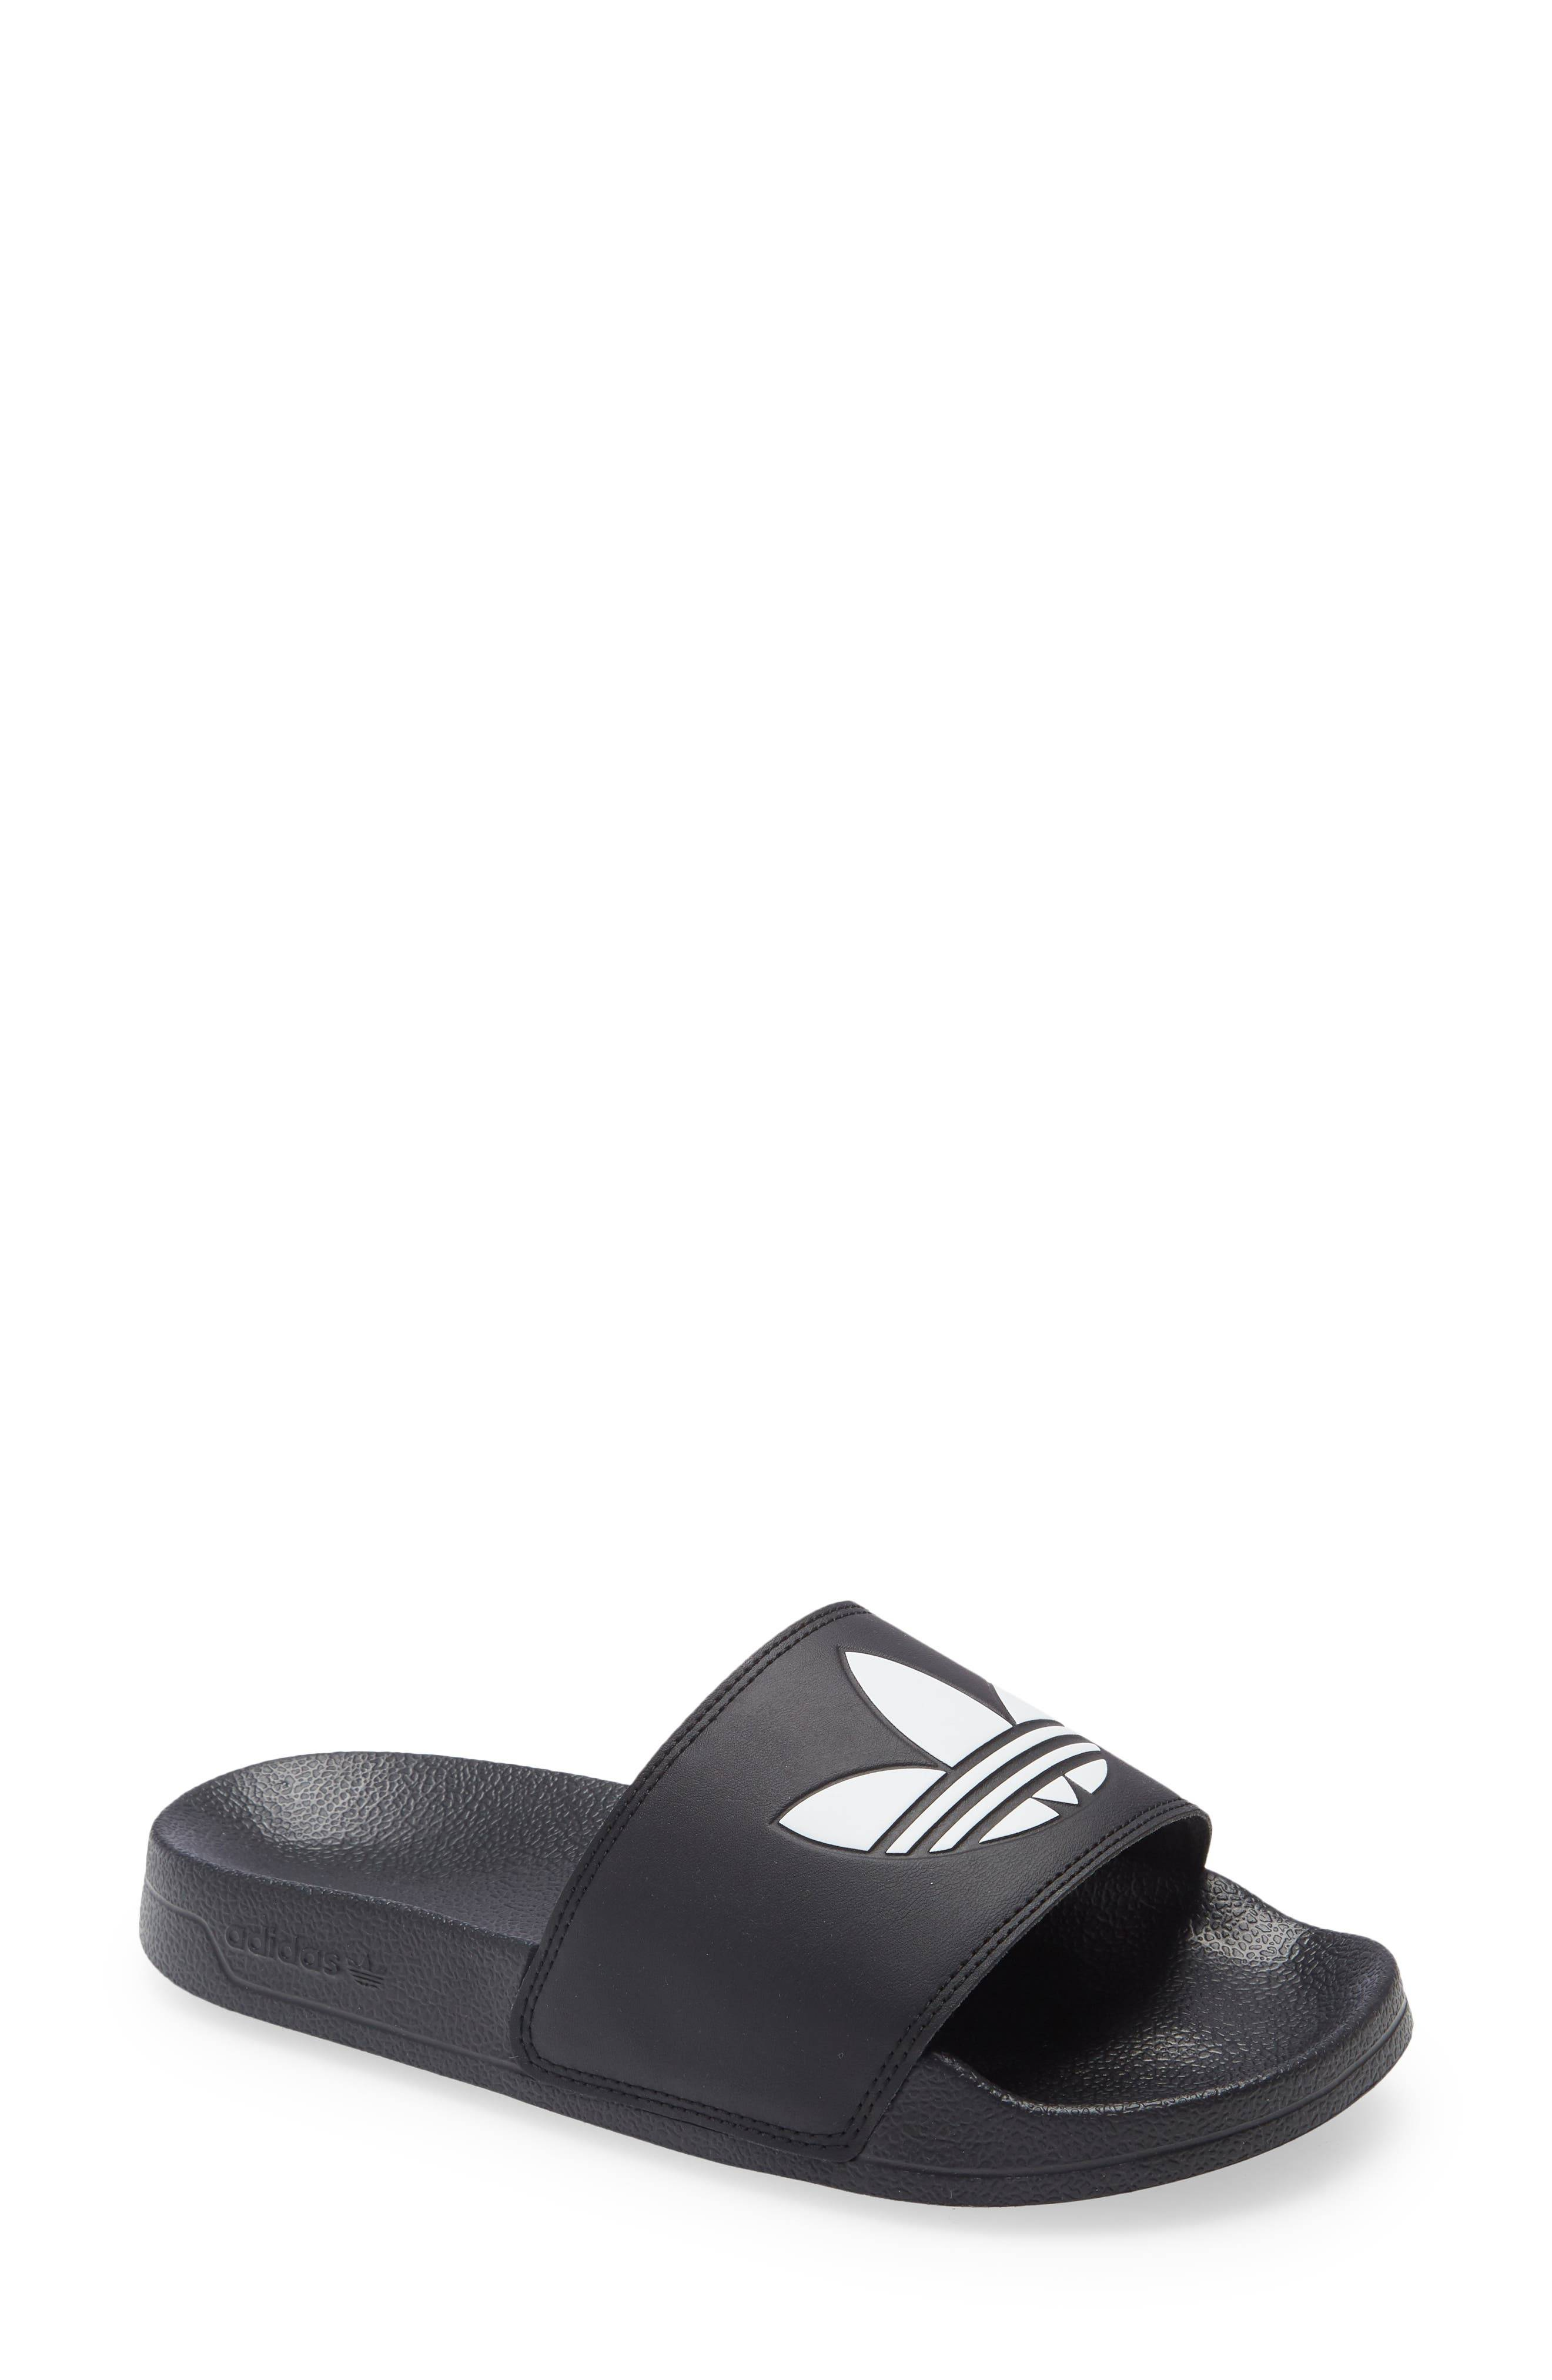 adidas Toddler Adidas Adilette Lite Sport Slide, Size 3 M - Black